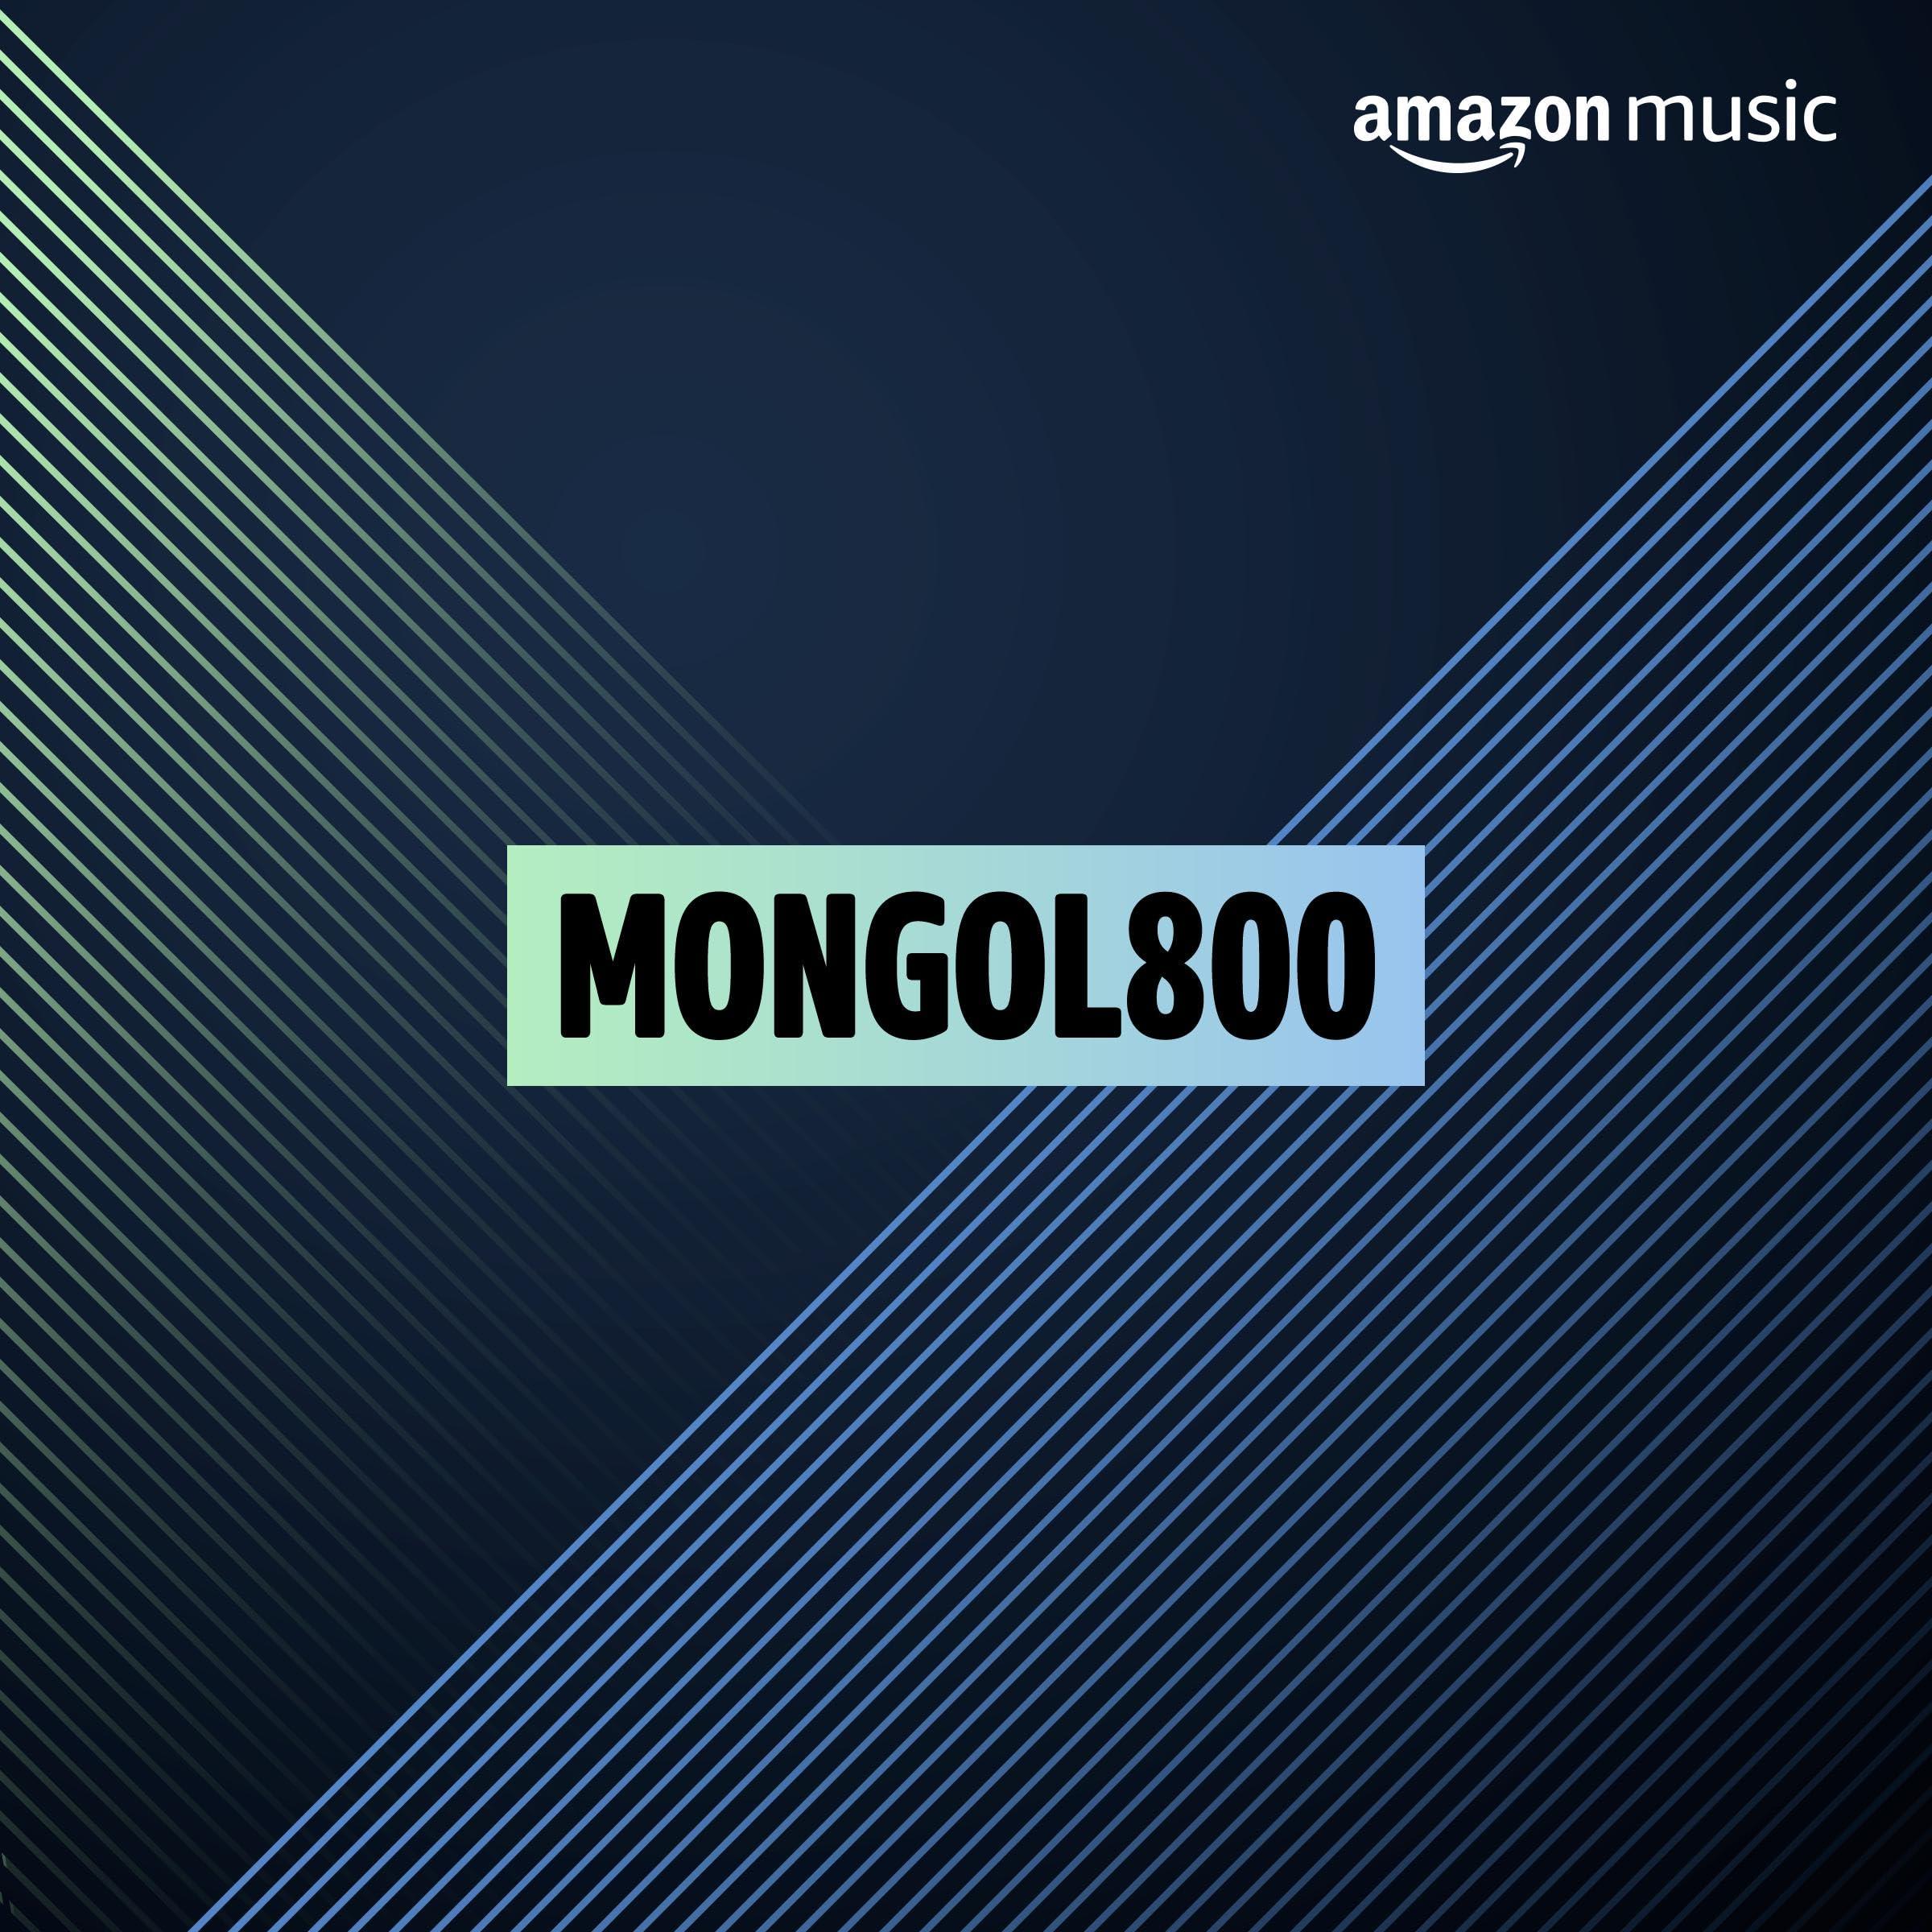 MONGOL800を聴いているお客様におすすめ